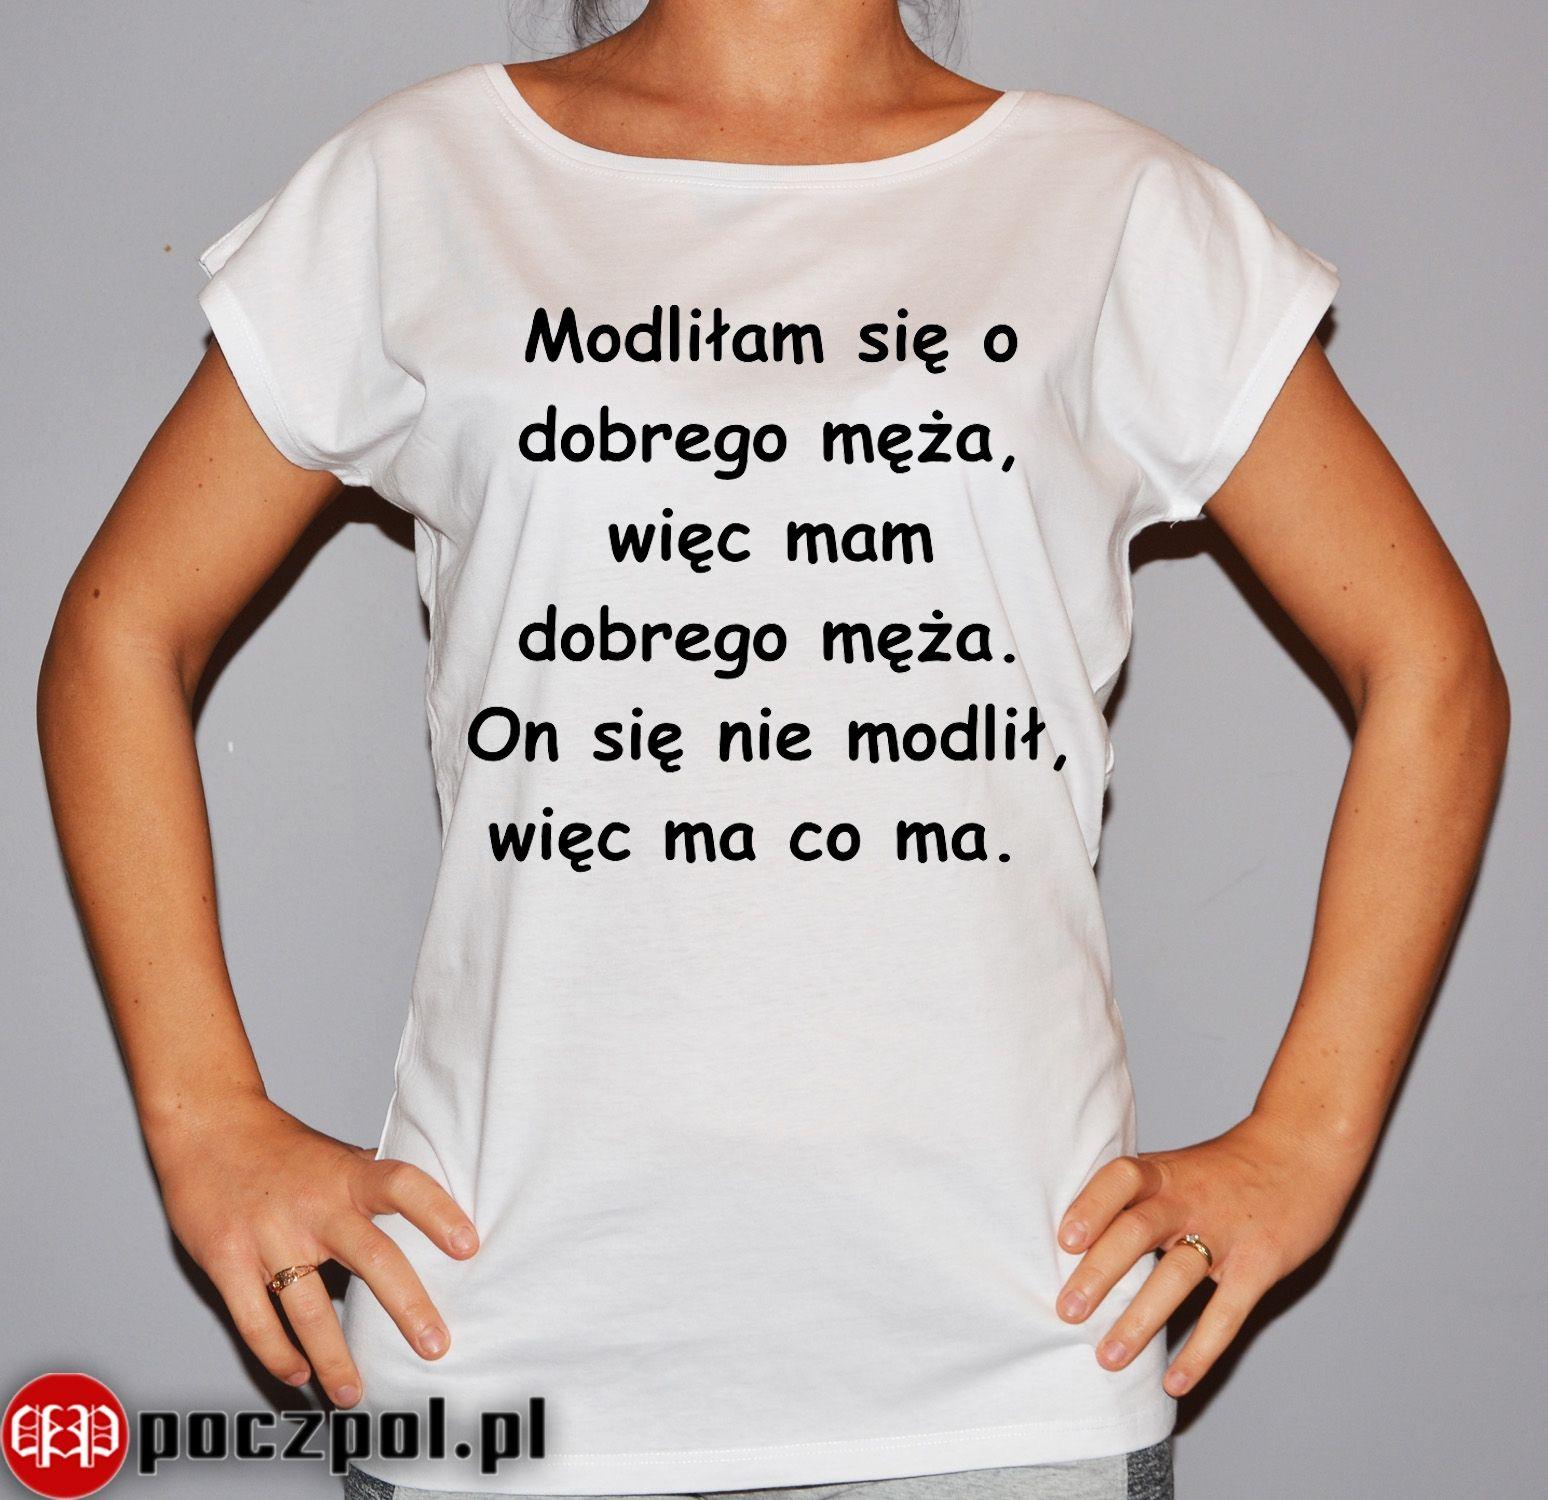 Modlilam Sie O Dobrego Meza With Images Smieszne Koszulki